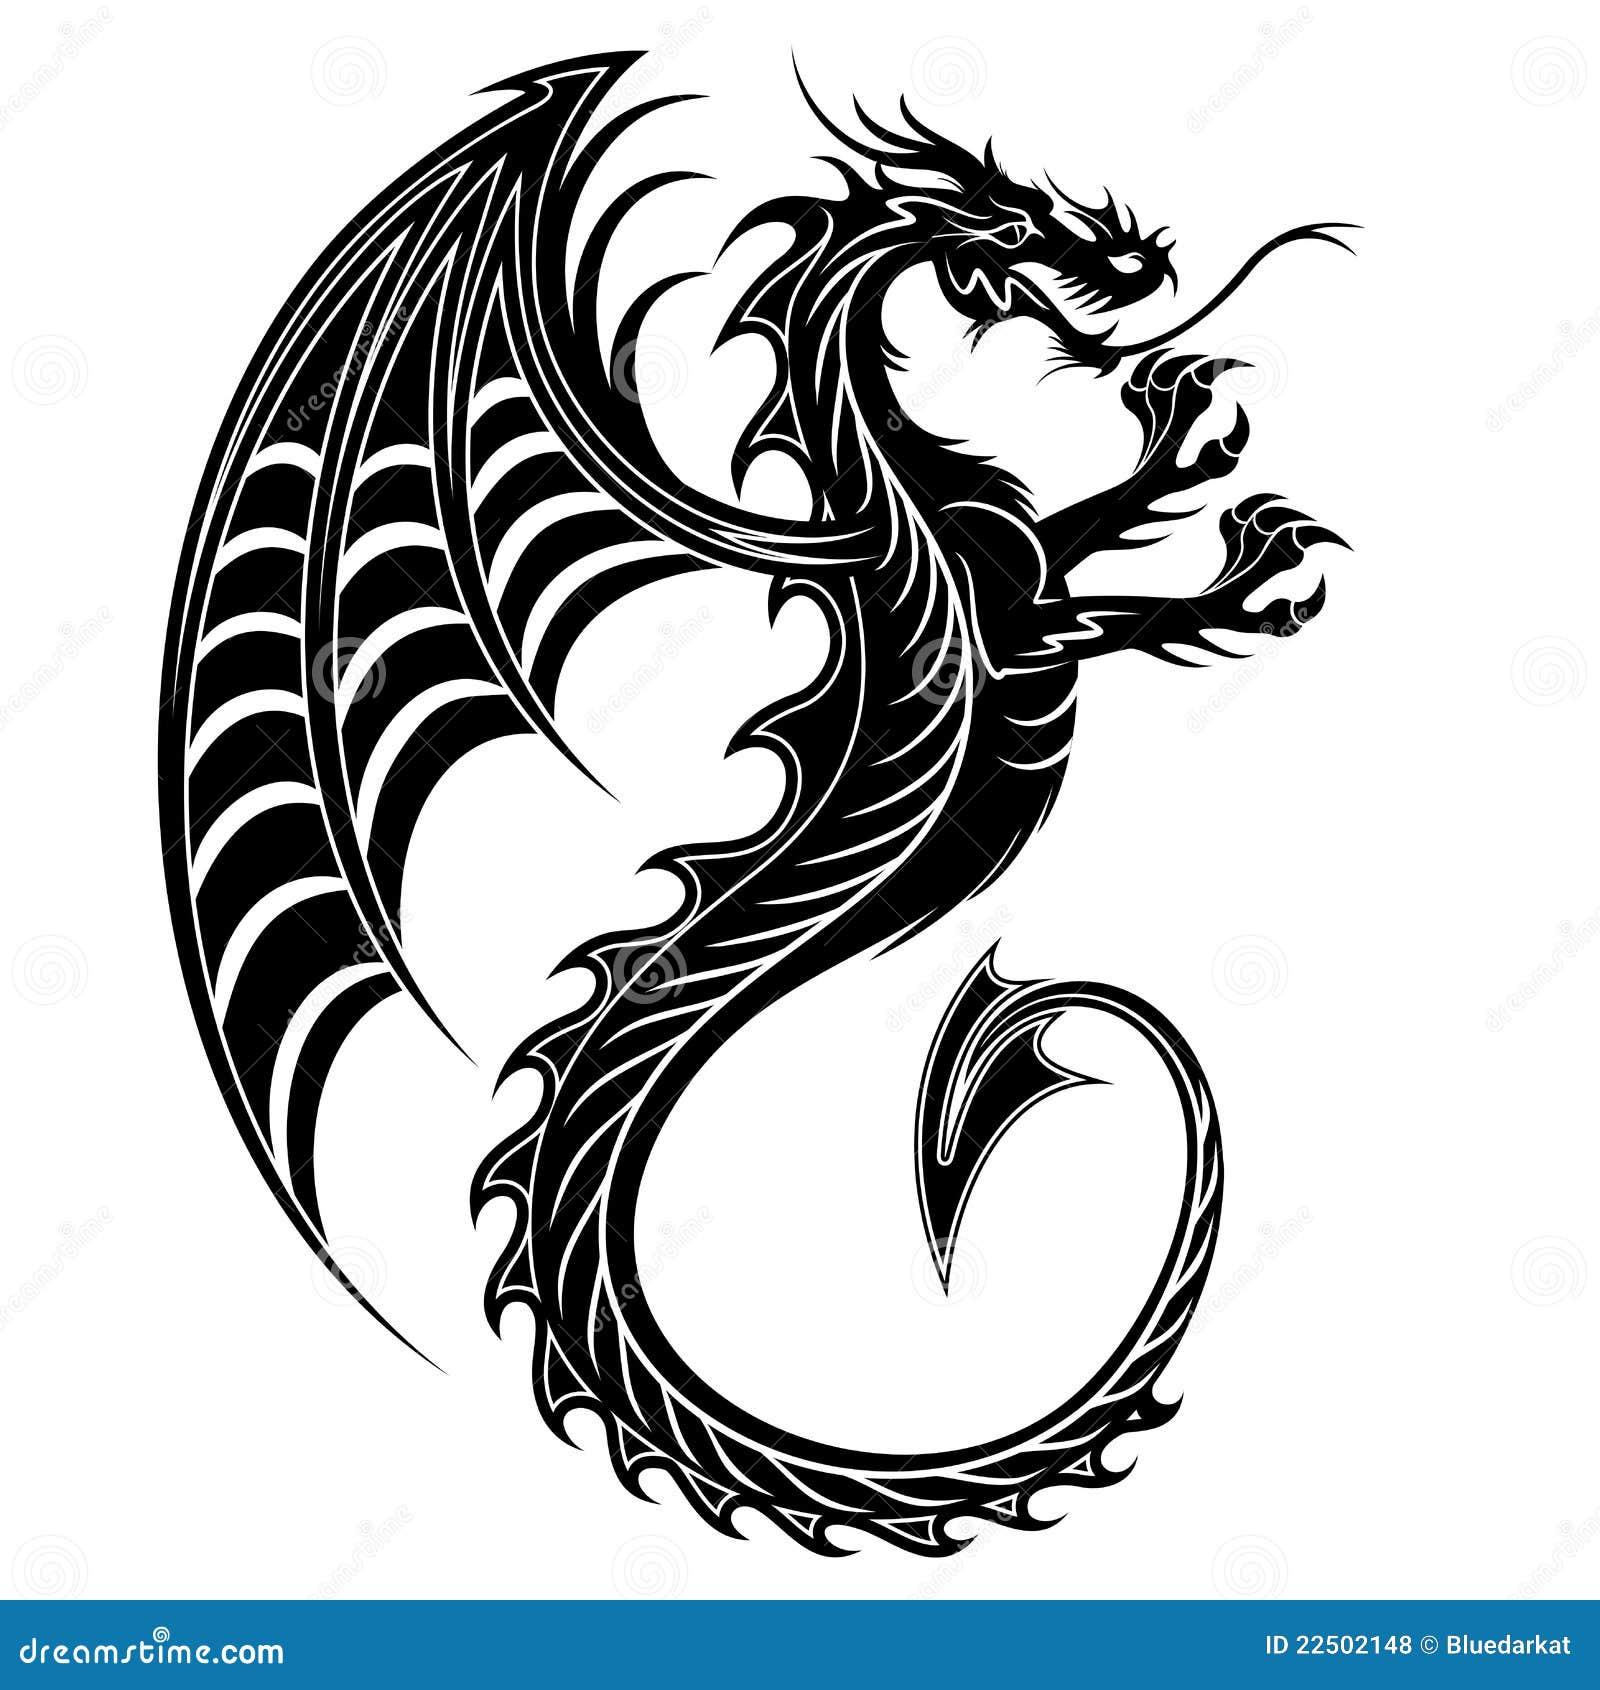 Dragon Tattoo Symbol 2012 Stock Vector Illustration Of Design